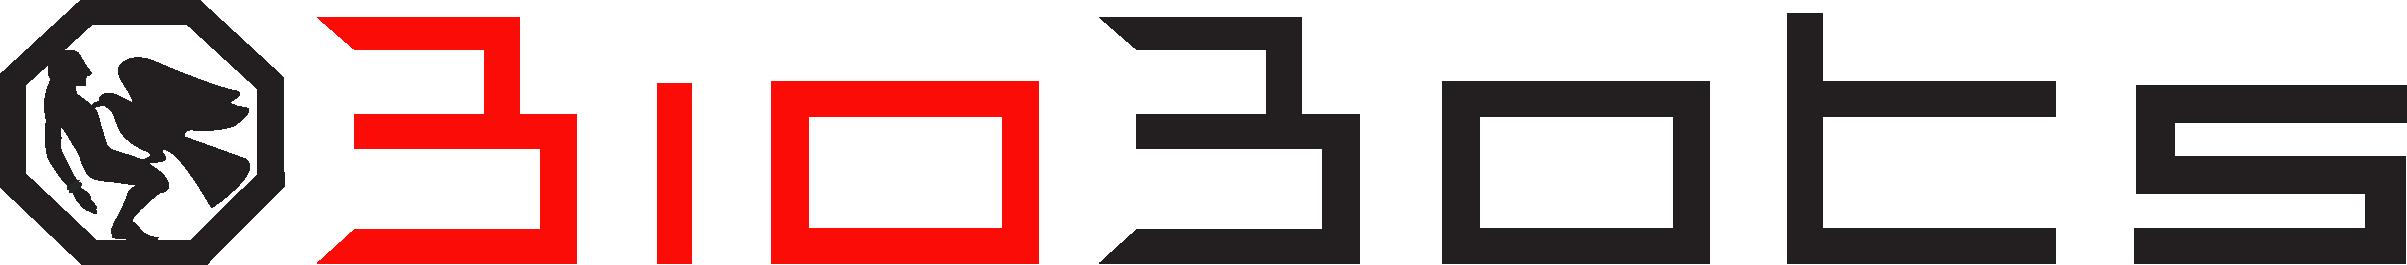 biobots-logo